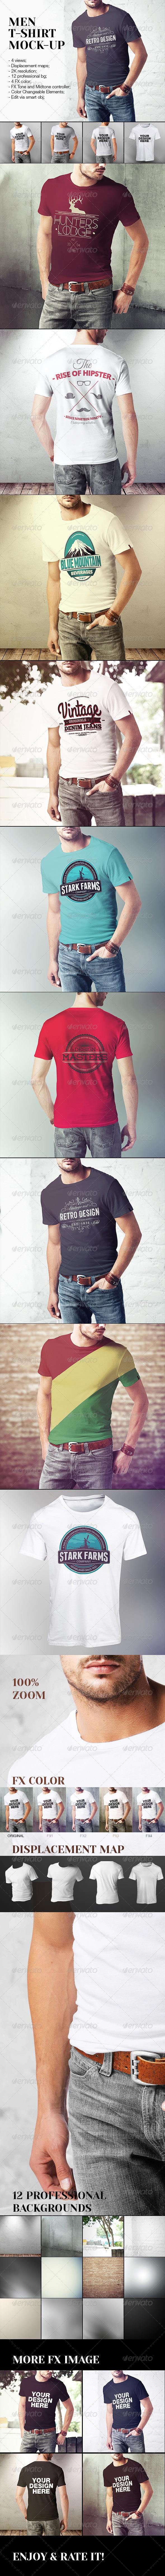 Men T-Shirt Mock-Up